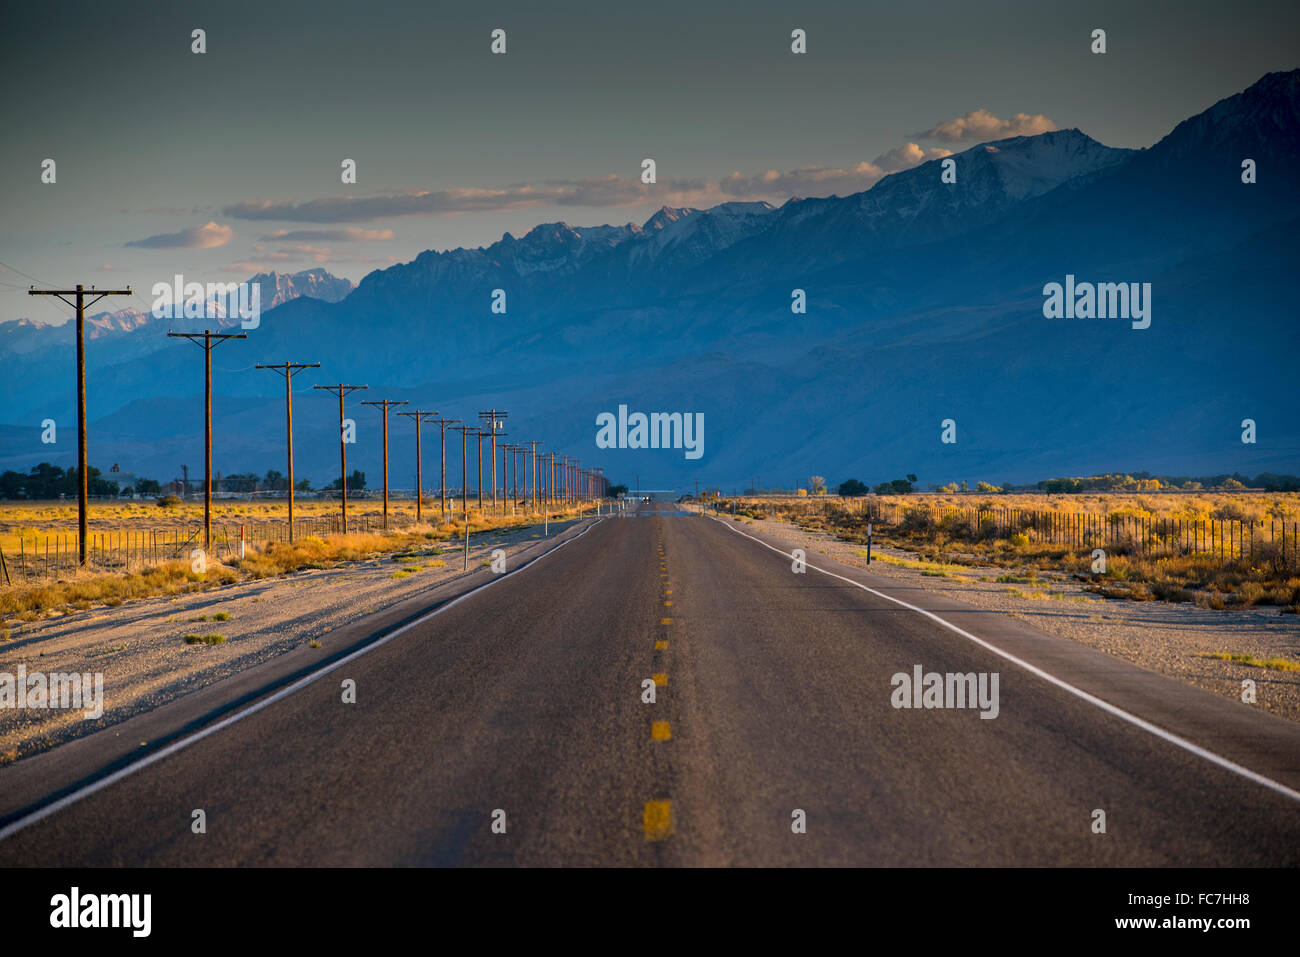 Carretera vacía en remoto paisaje Foto de stock